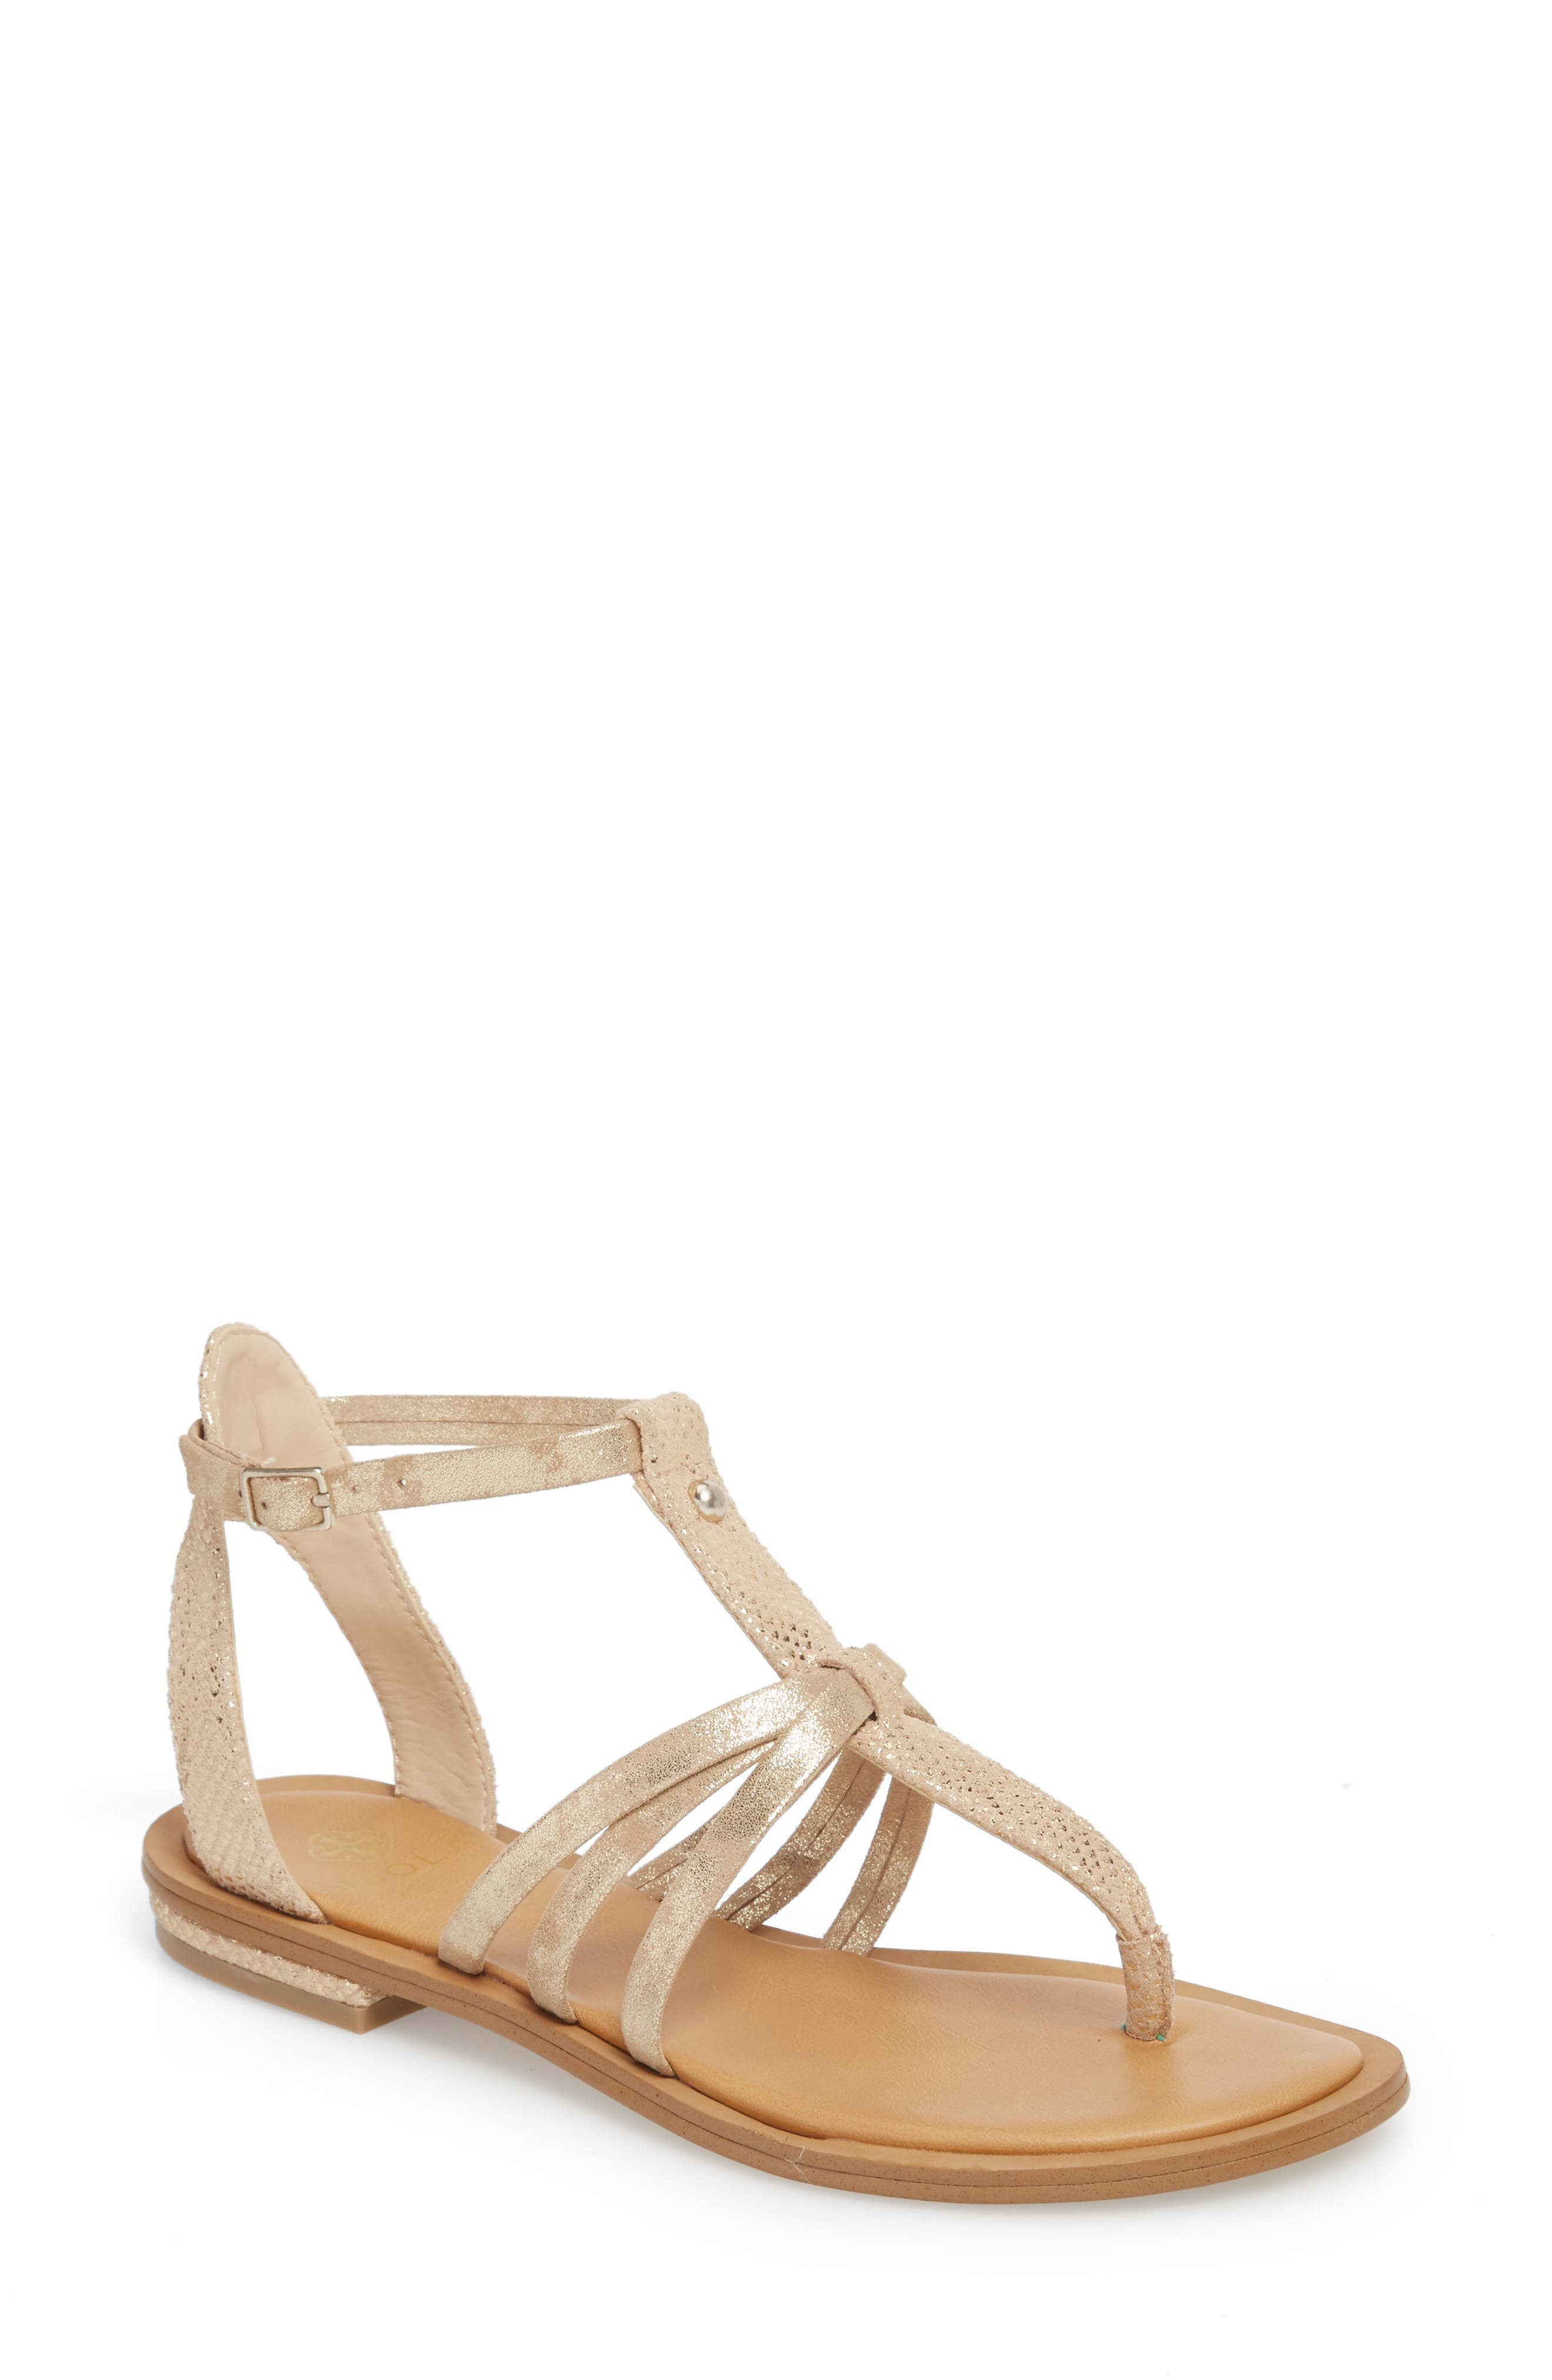 8462b472268 gold gladiator sandal